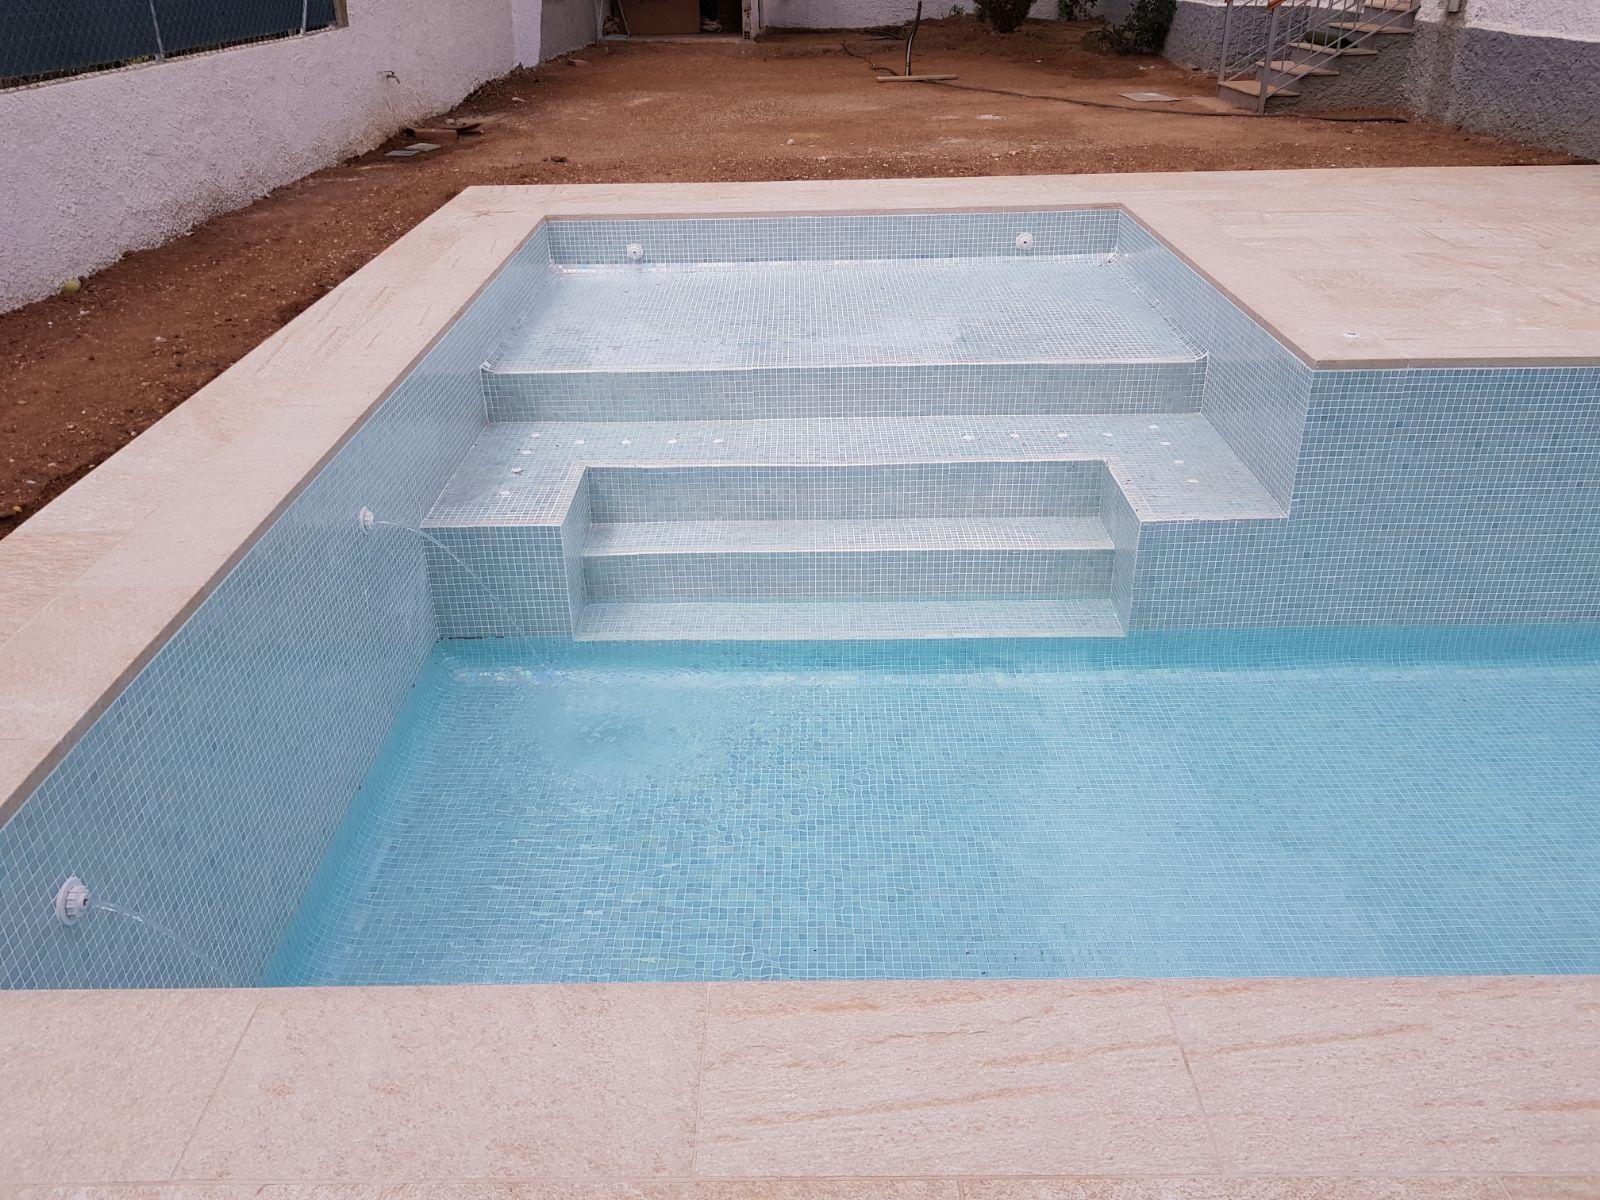 reforma_piscina_1_21